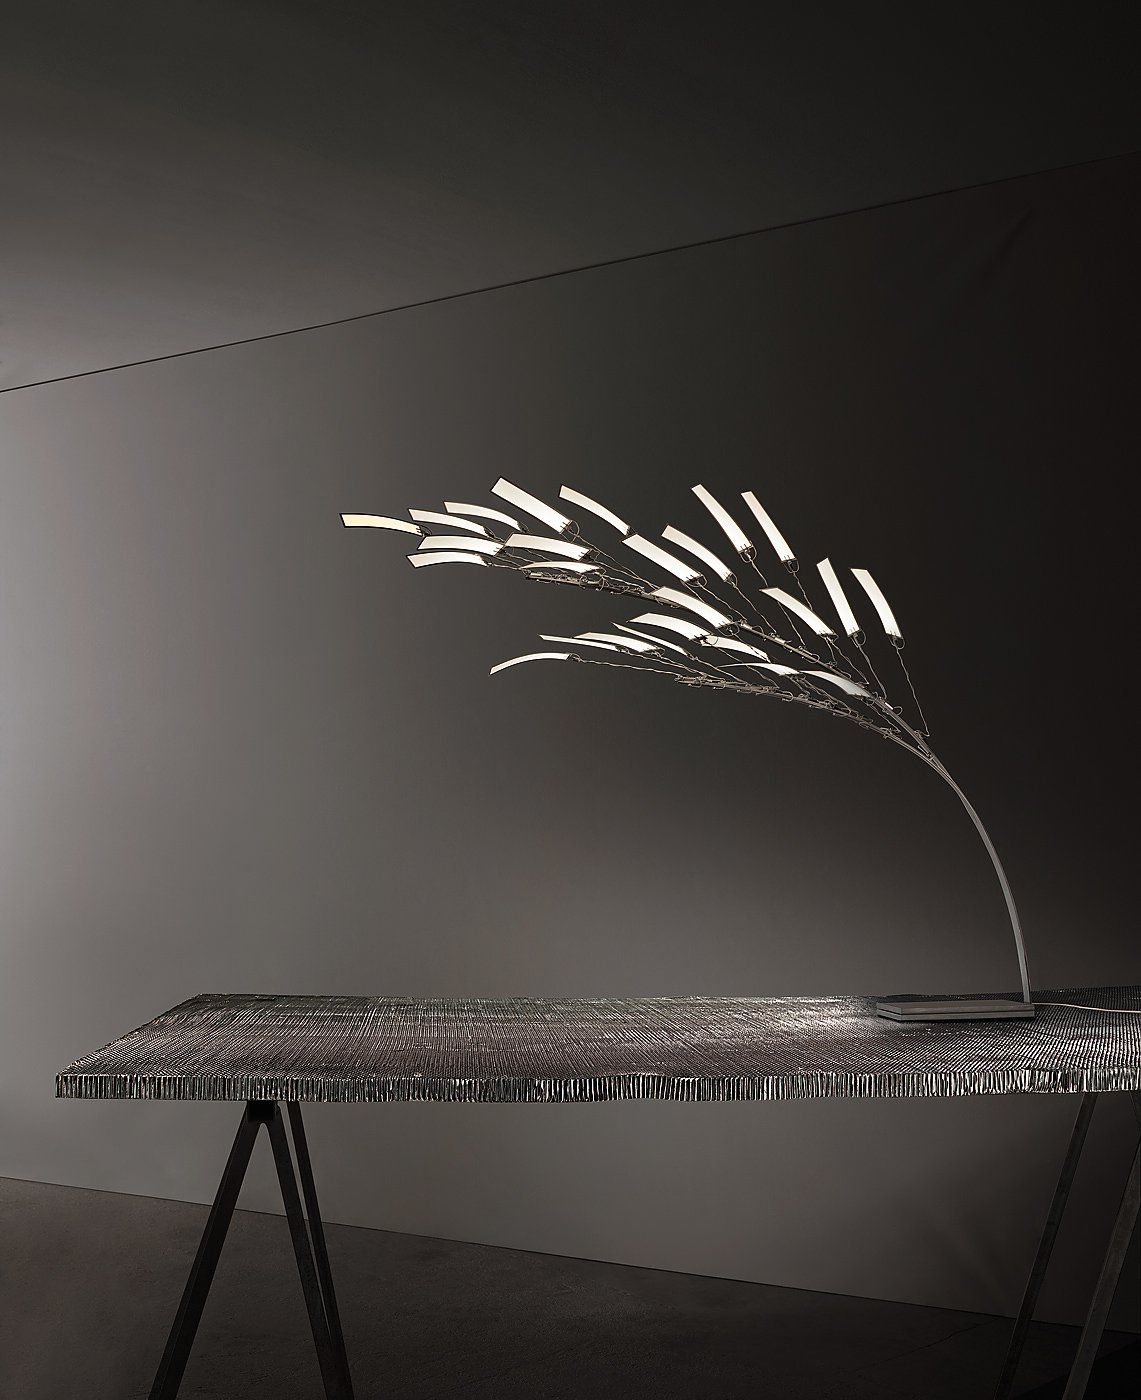 whisper wind prodotti ingo maurer gmbh milan 2014 pinterest illuminazione interni e. Black Bedroom Furniture Sets. Home Design Ideas